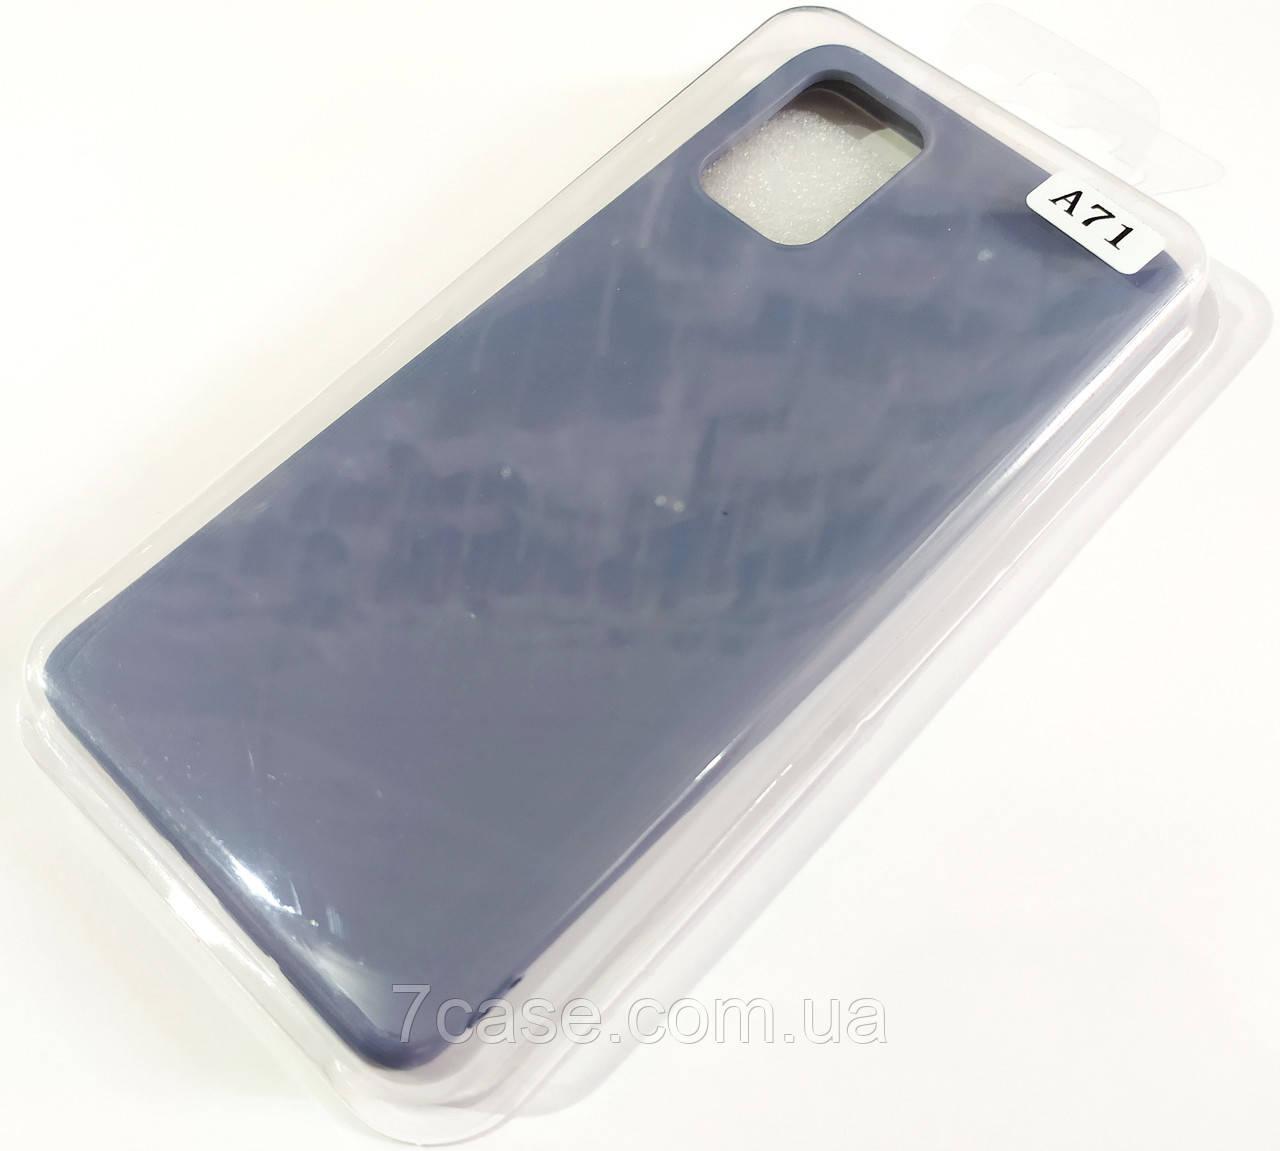 Чехол для Samsung Galaxy A71 A715F матовый Silicone Case Full Cover Macarons Color